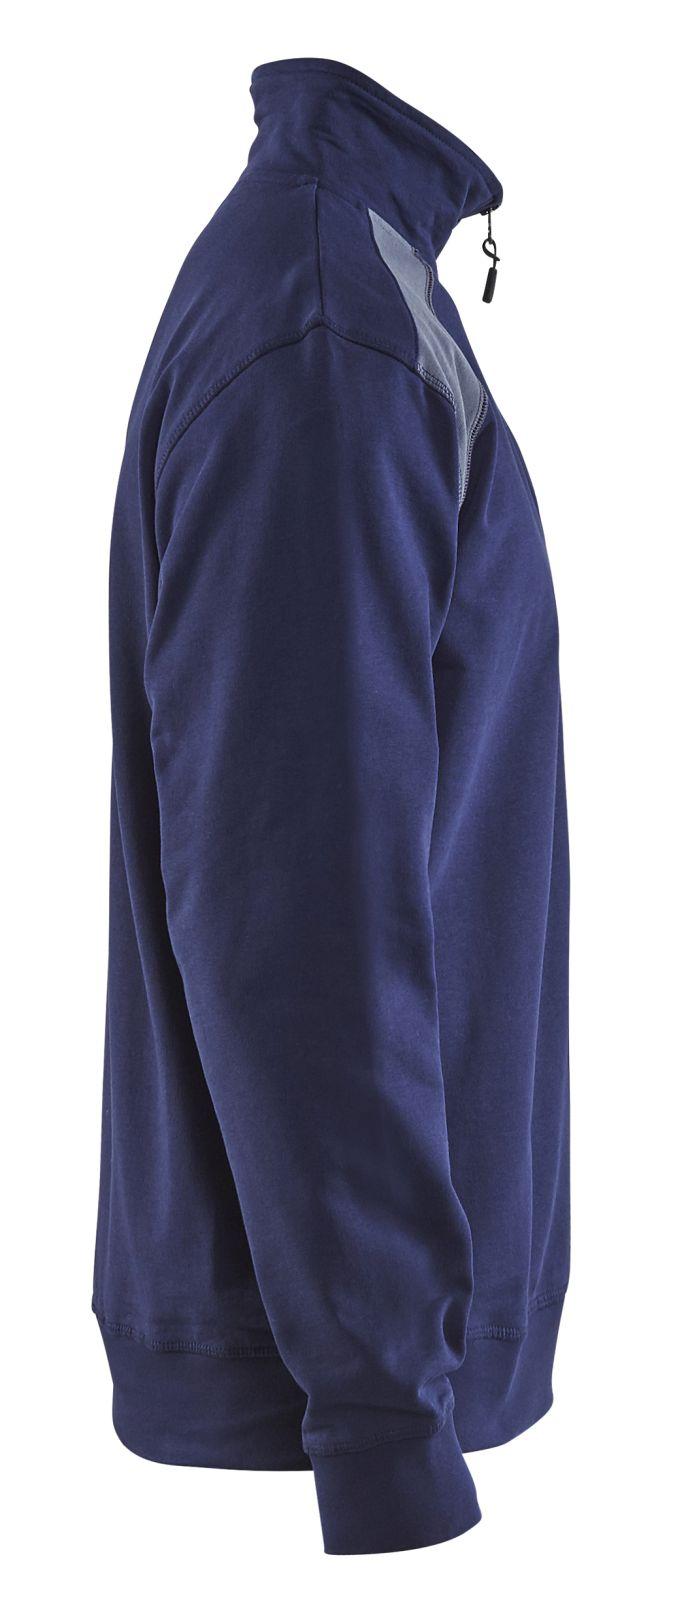 Blaklader Truien 33531158 marineblauw-grijs(8994)